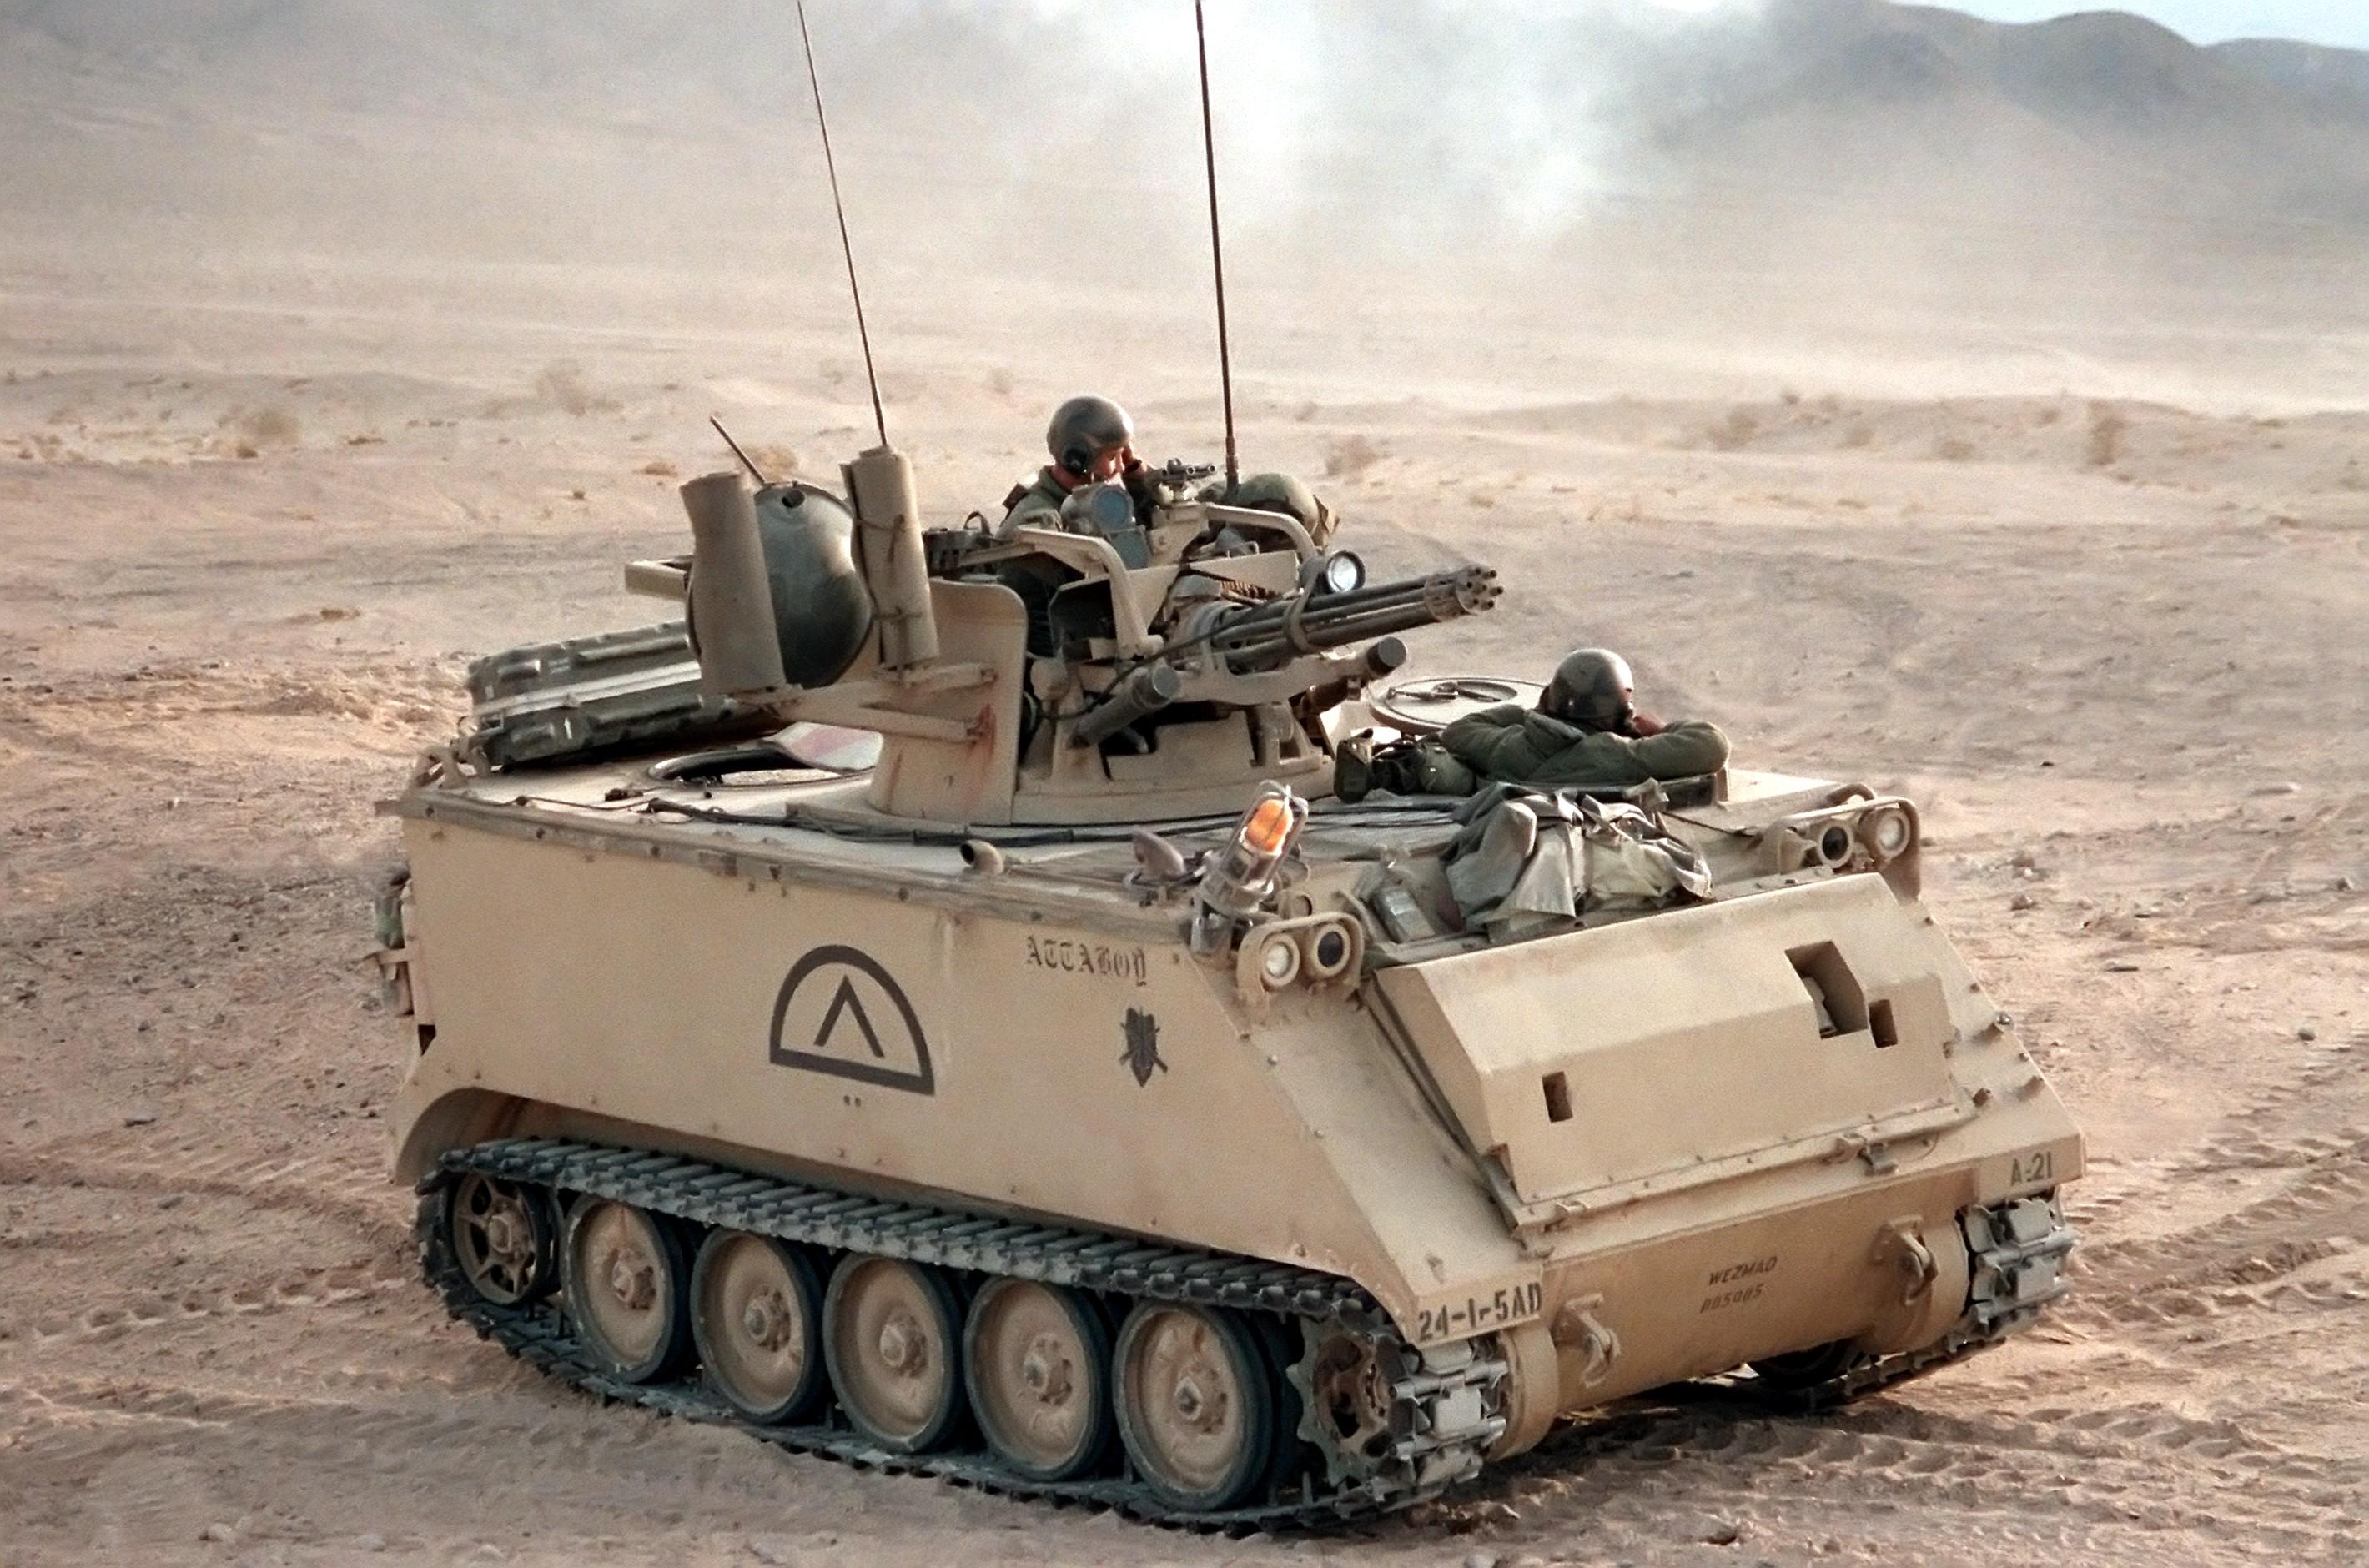 M163_VADS.JPEG